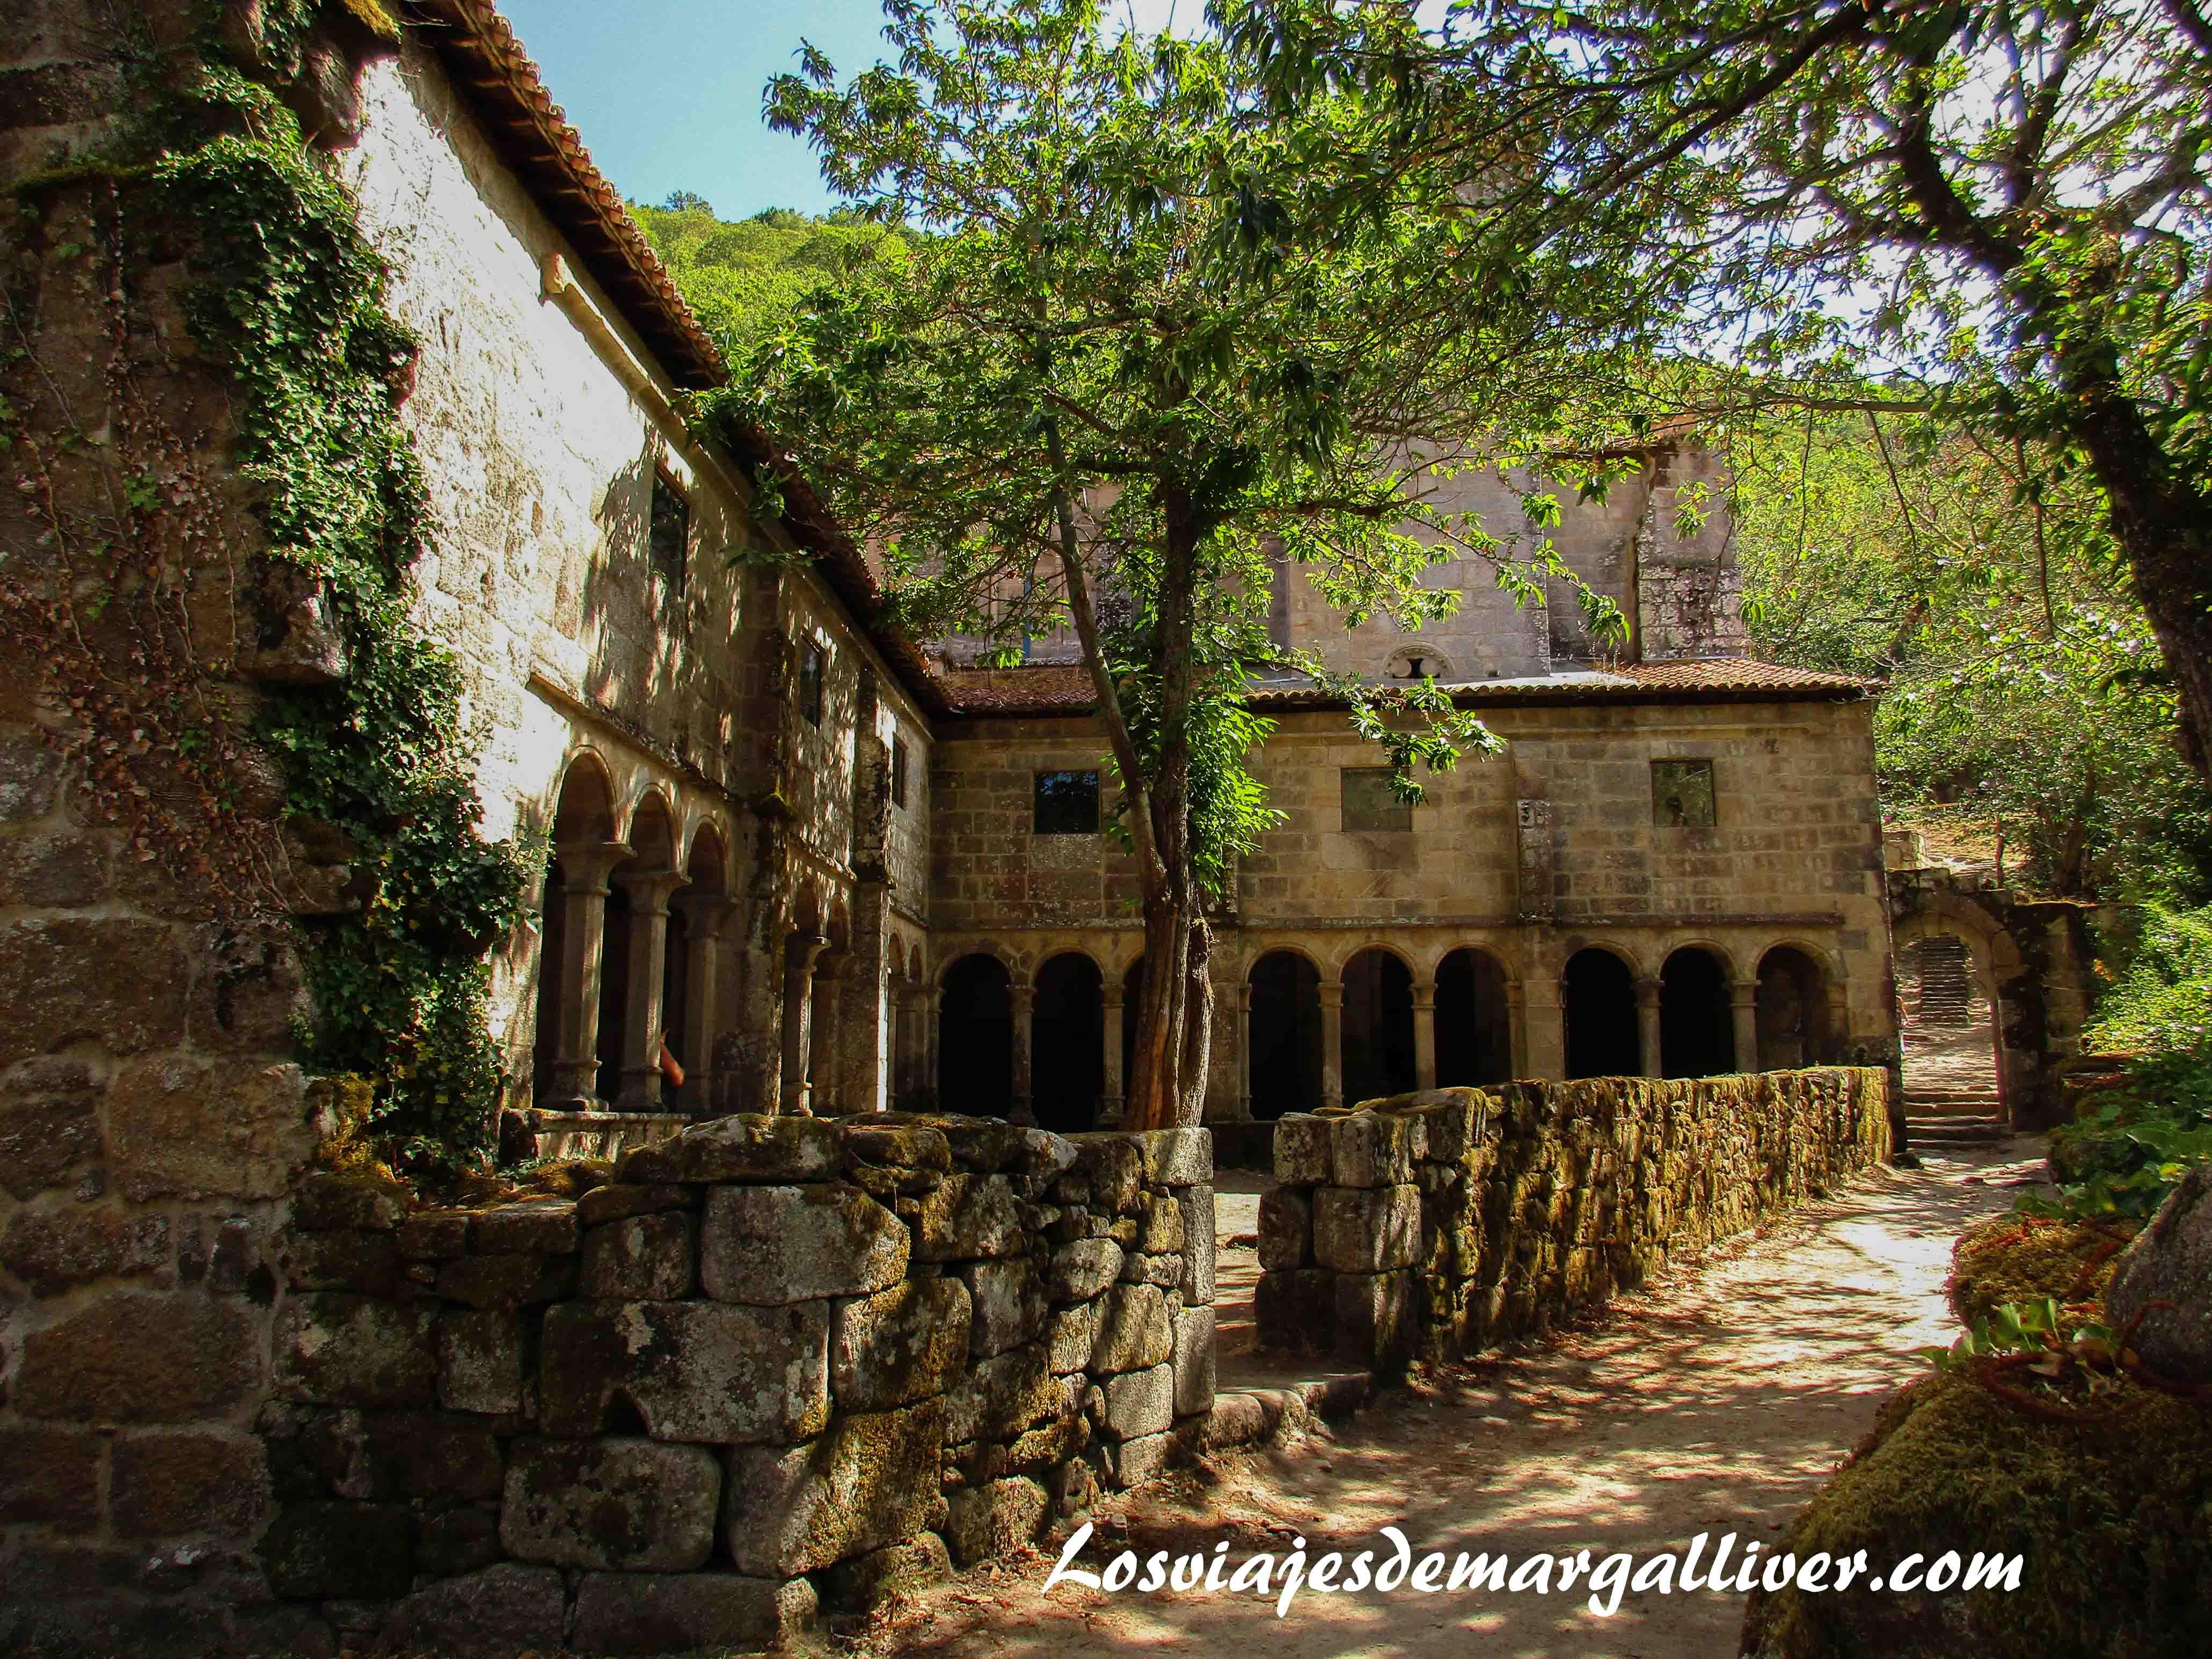 Monasterio de Sta. Cristina do Ribas do Sil en la Ribeira Sacra - Los viajes de Margalliver